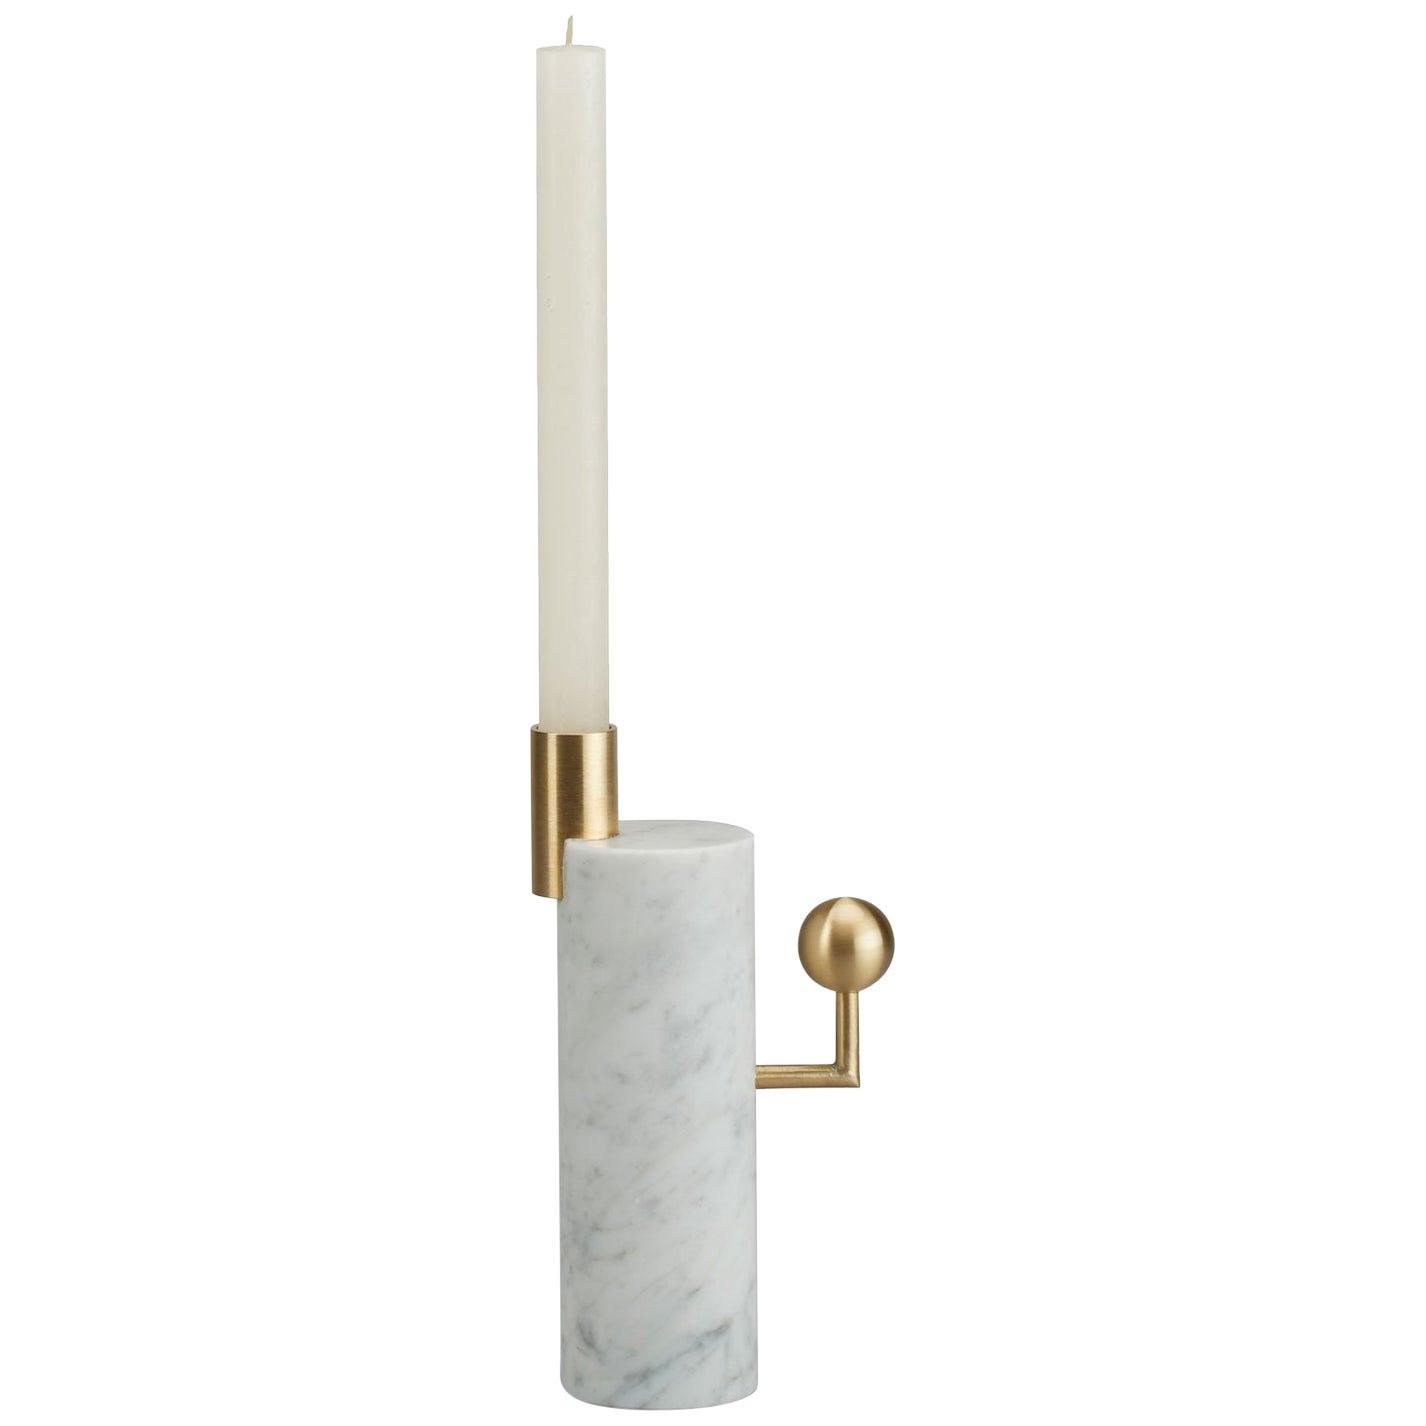 Stargazer Candleholder, Carrara Marble and Brass, by Lara Bohinc, In Stock